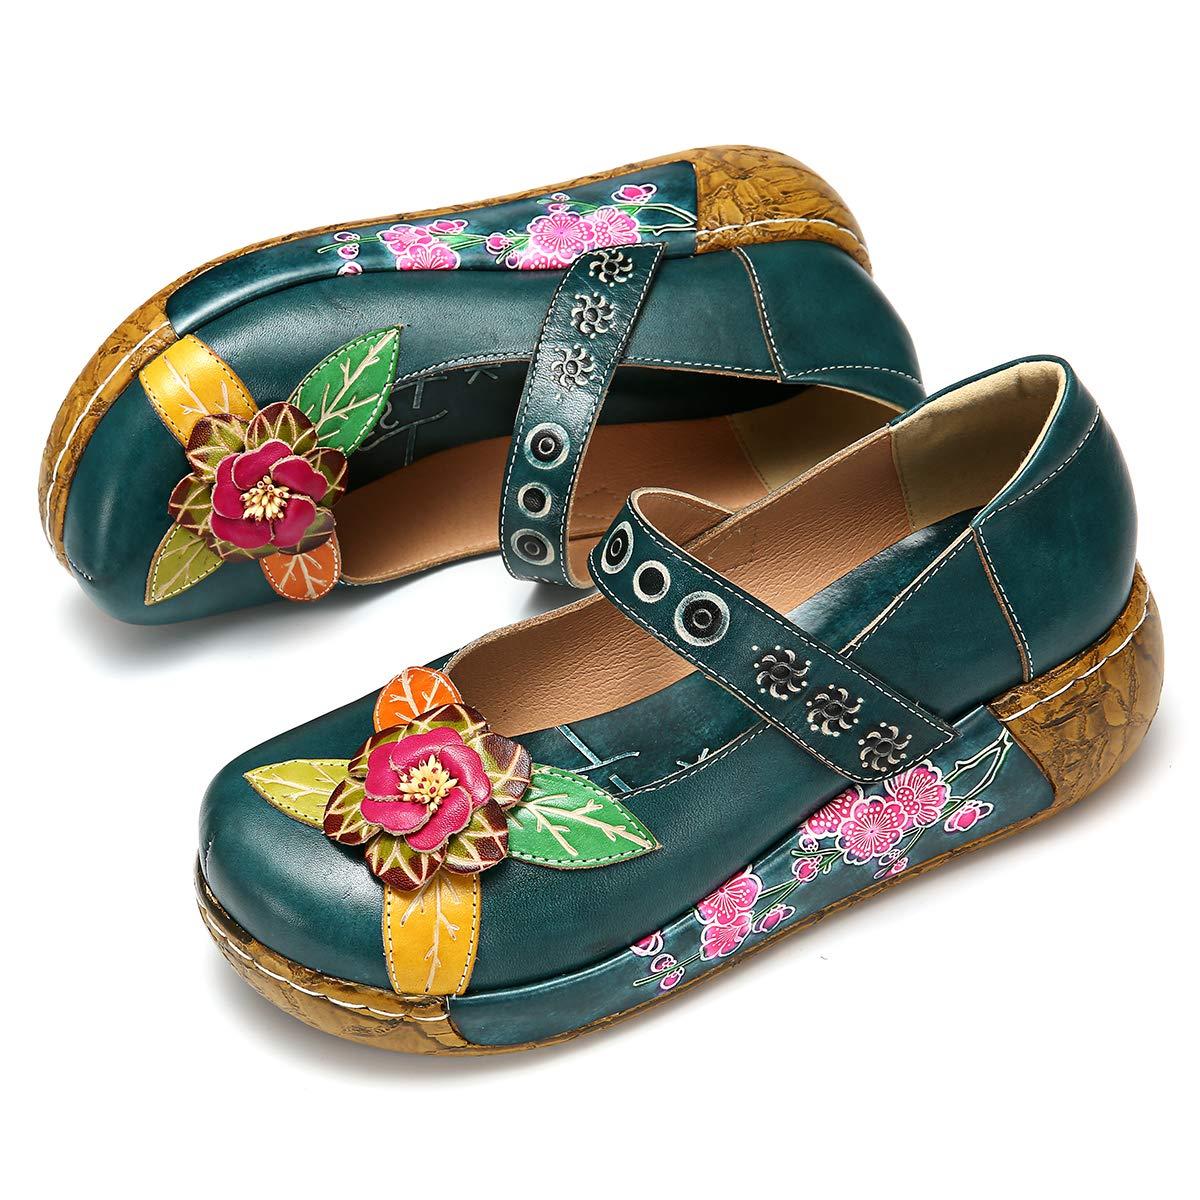 b753d8f8516c4 gracosy Womens Platform Sandals Shoes for Spring Summer Leather Velcro Slip  ON Mule Clogs Casual Comfort Wedged Slides Sandals Vintage Handmade Flower  ...